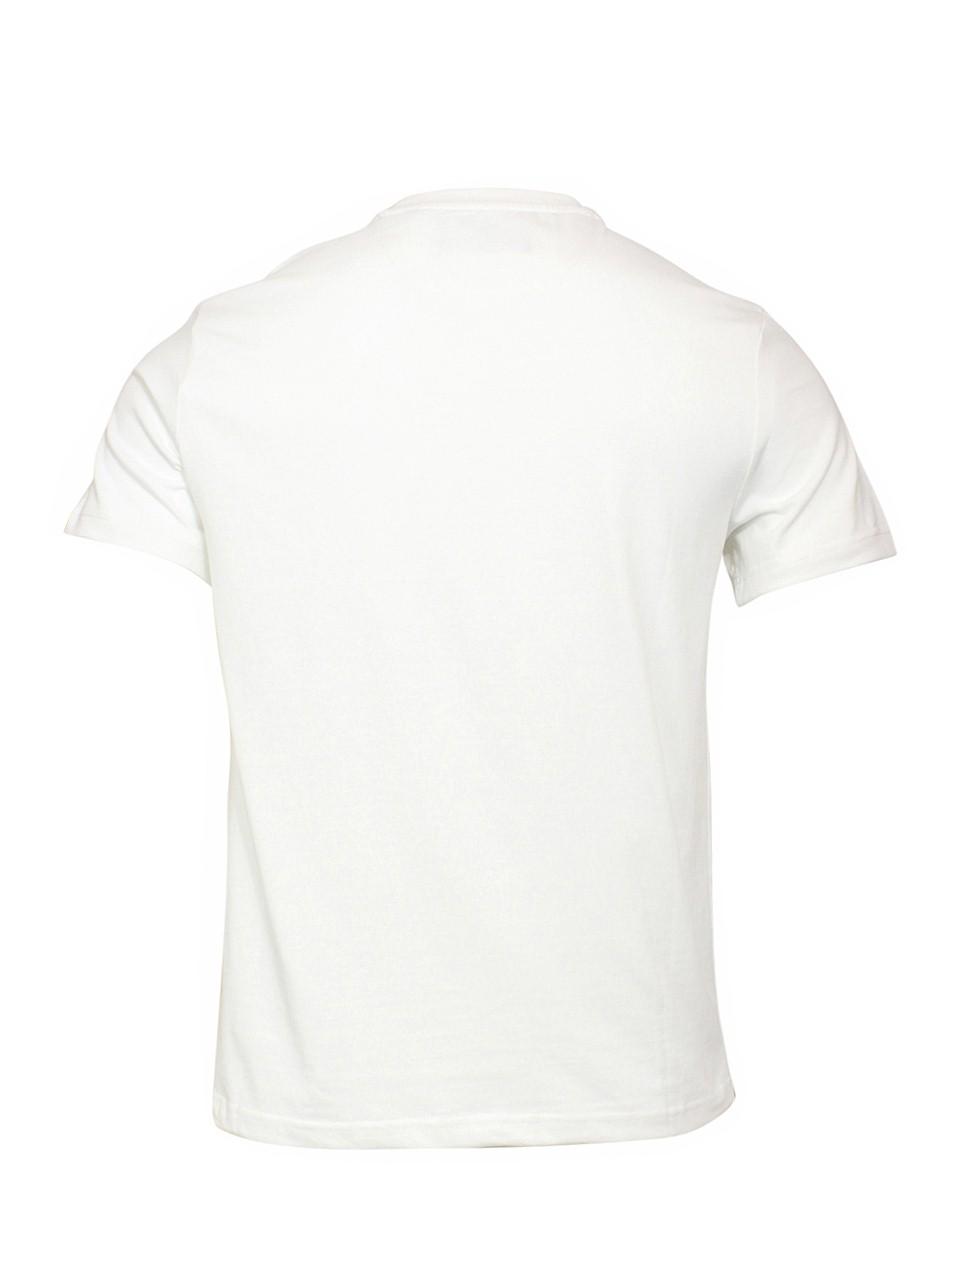 Avirex-Men-039-s-Wingstar-Short-Sleeve-Crew-Neck-Cotton-T-Shirt thumbnail 8